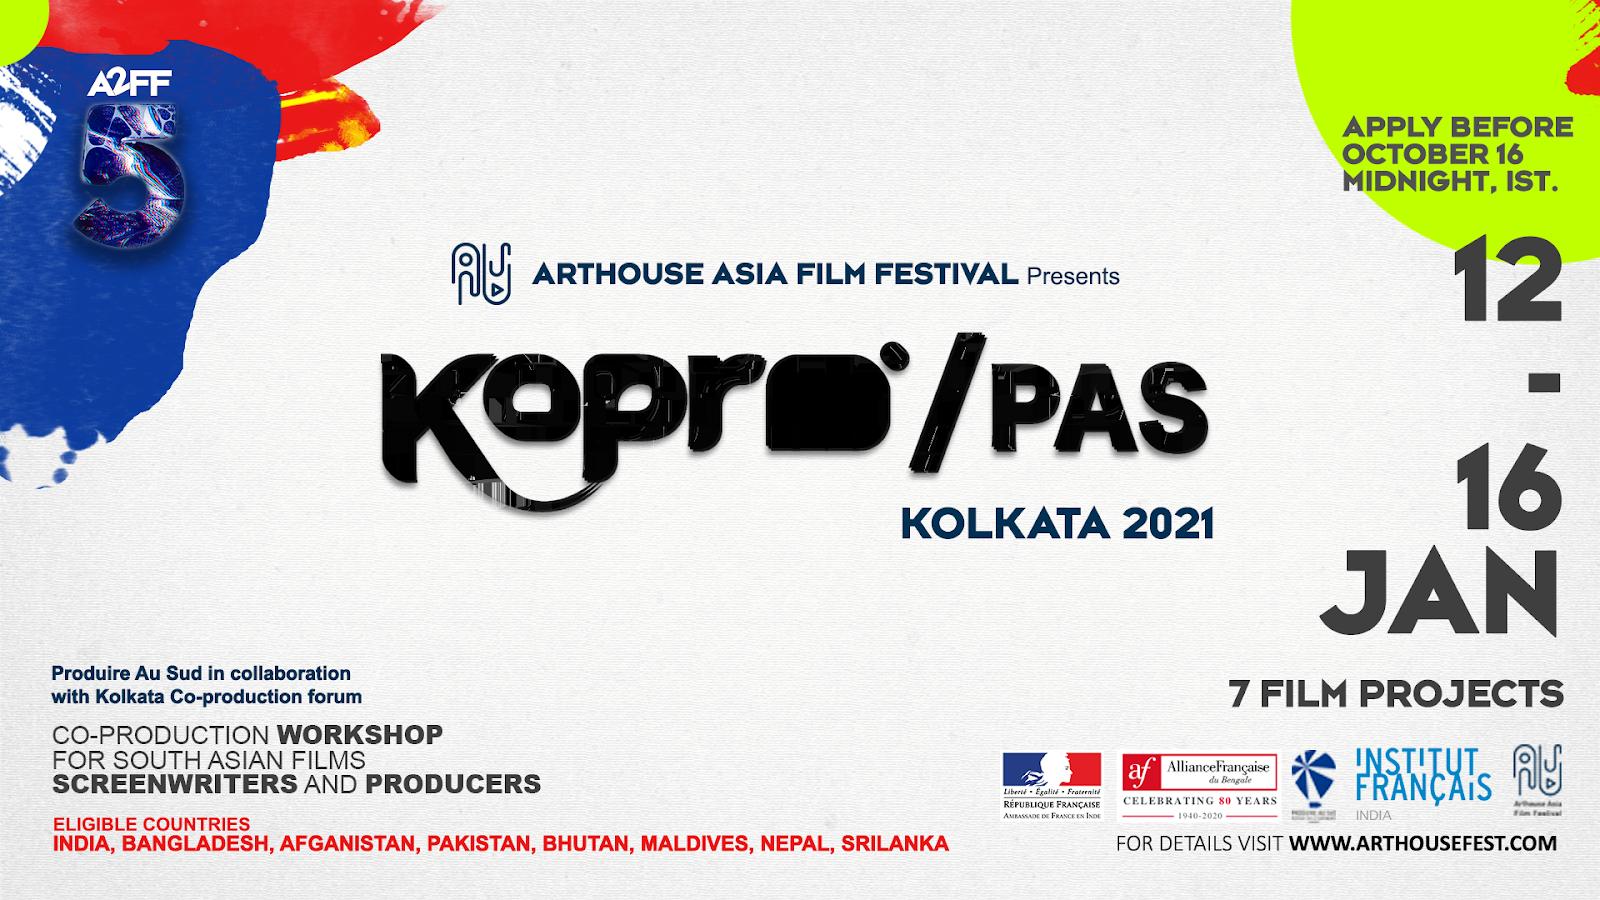 KoPro/PAS 2021